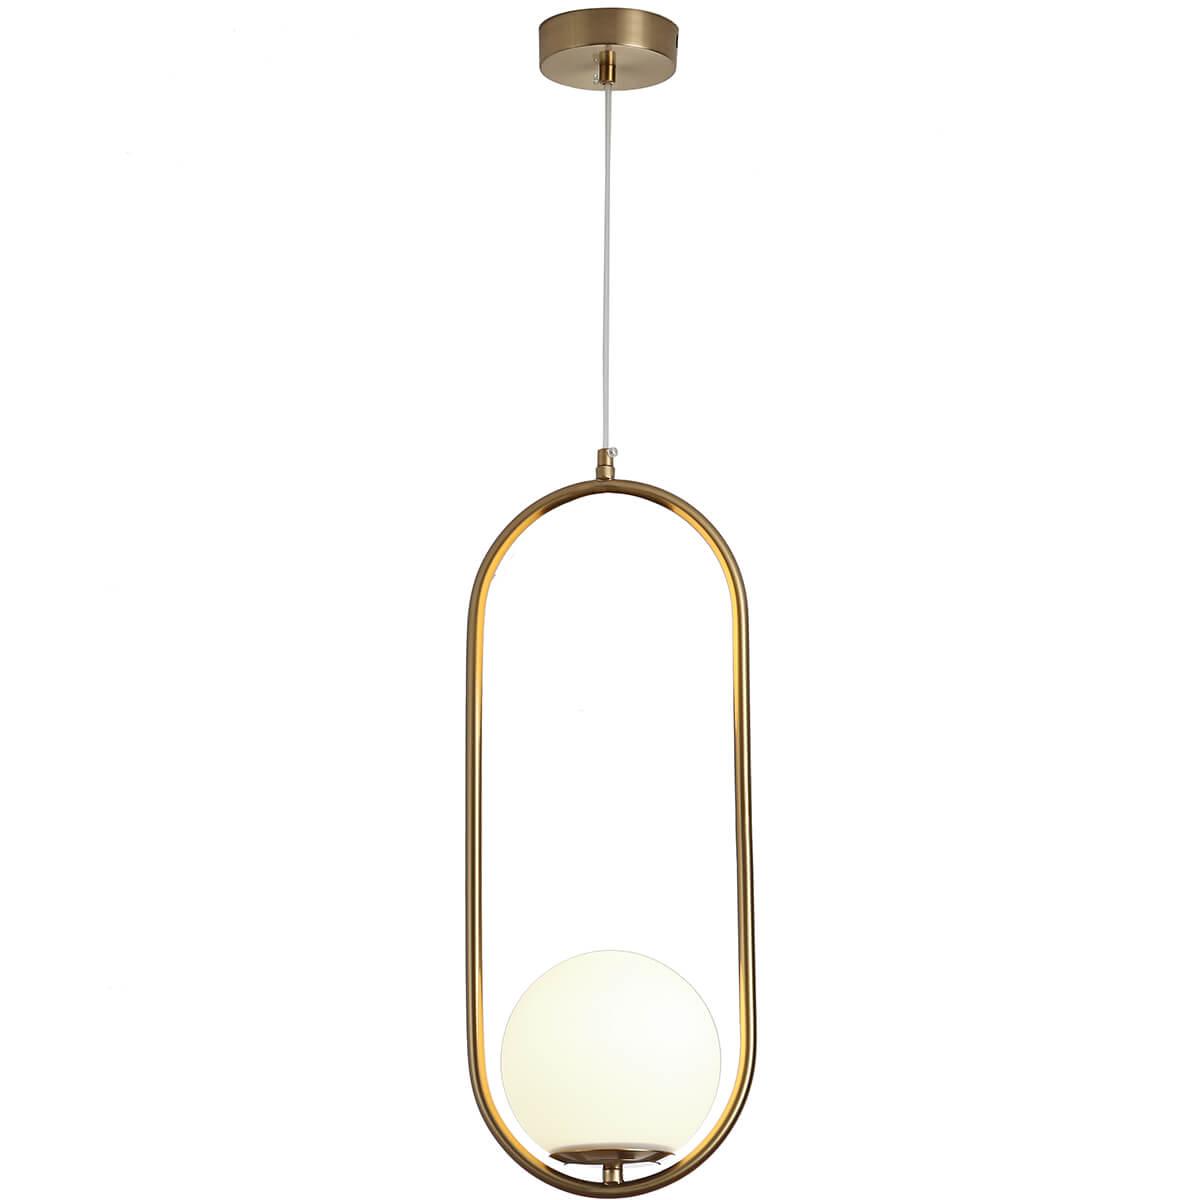 цена на Светильник Kink Light 07632-1A,20 Кенти